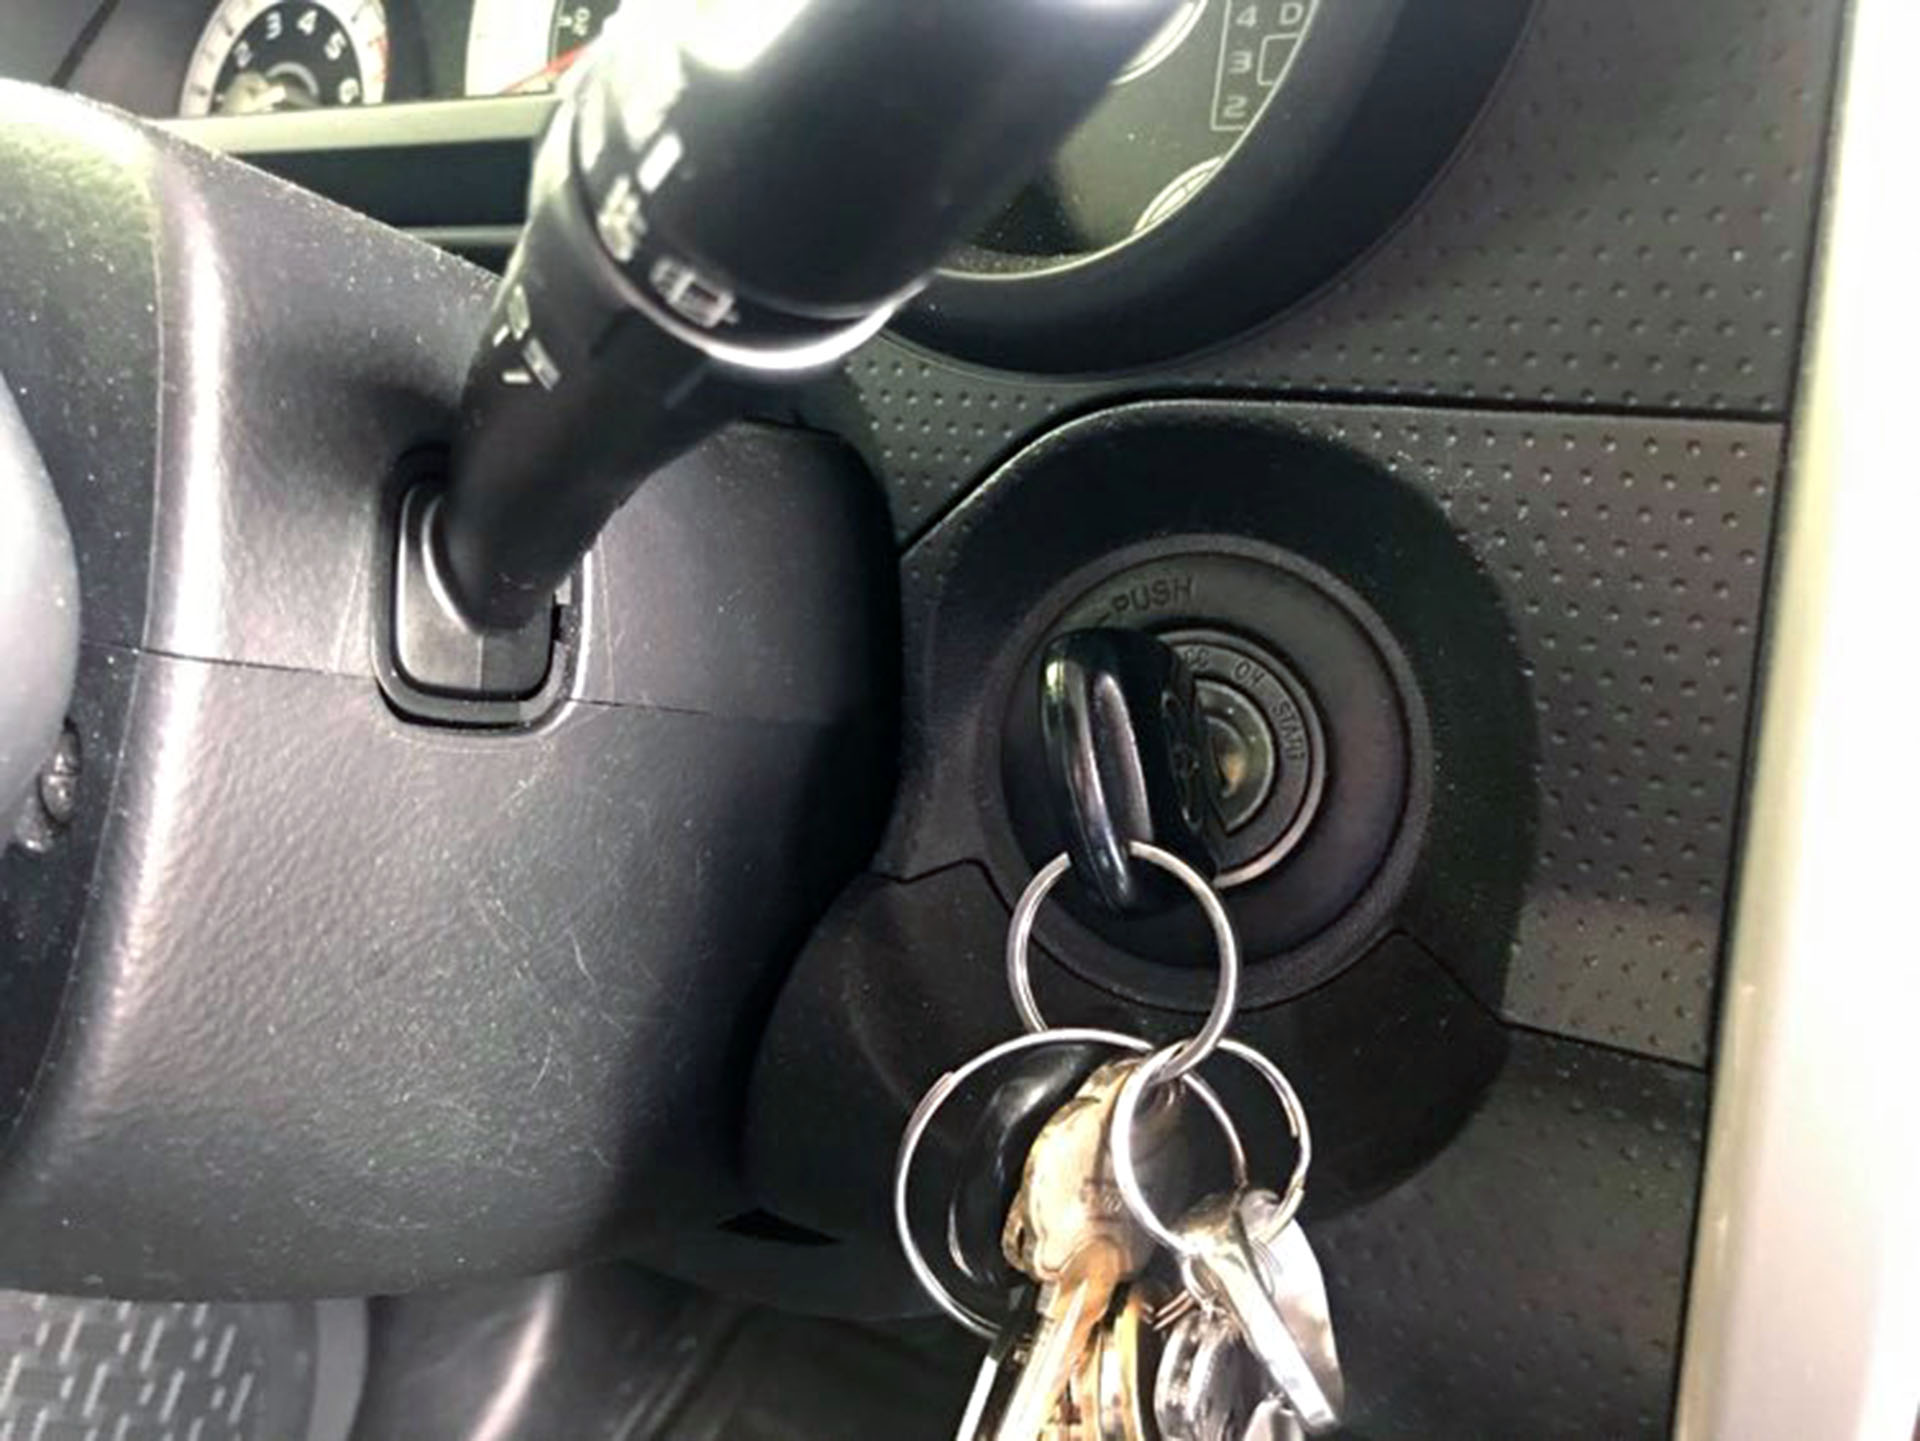 Car problems during Coronavirus